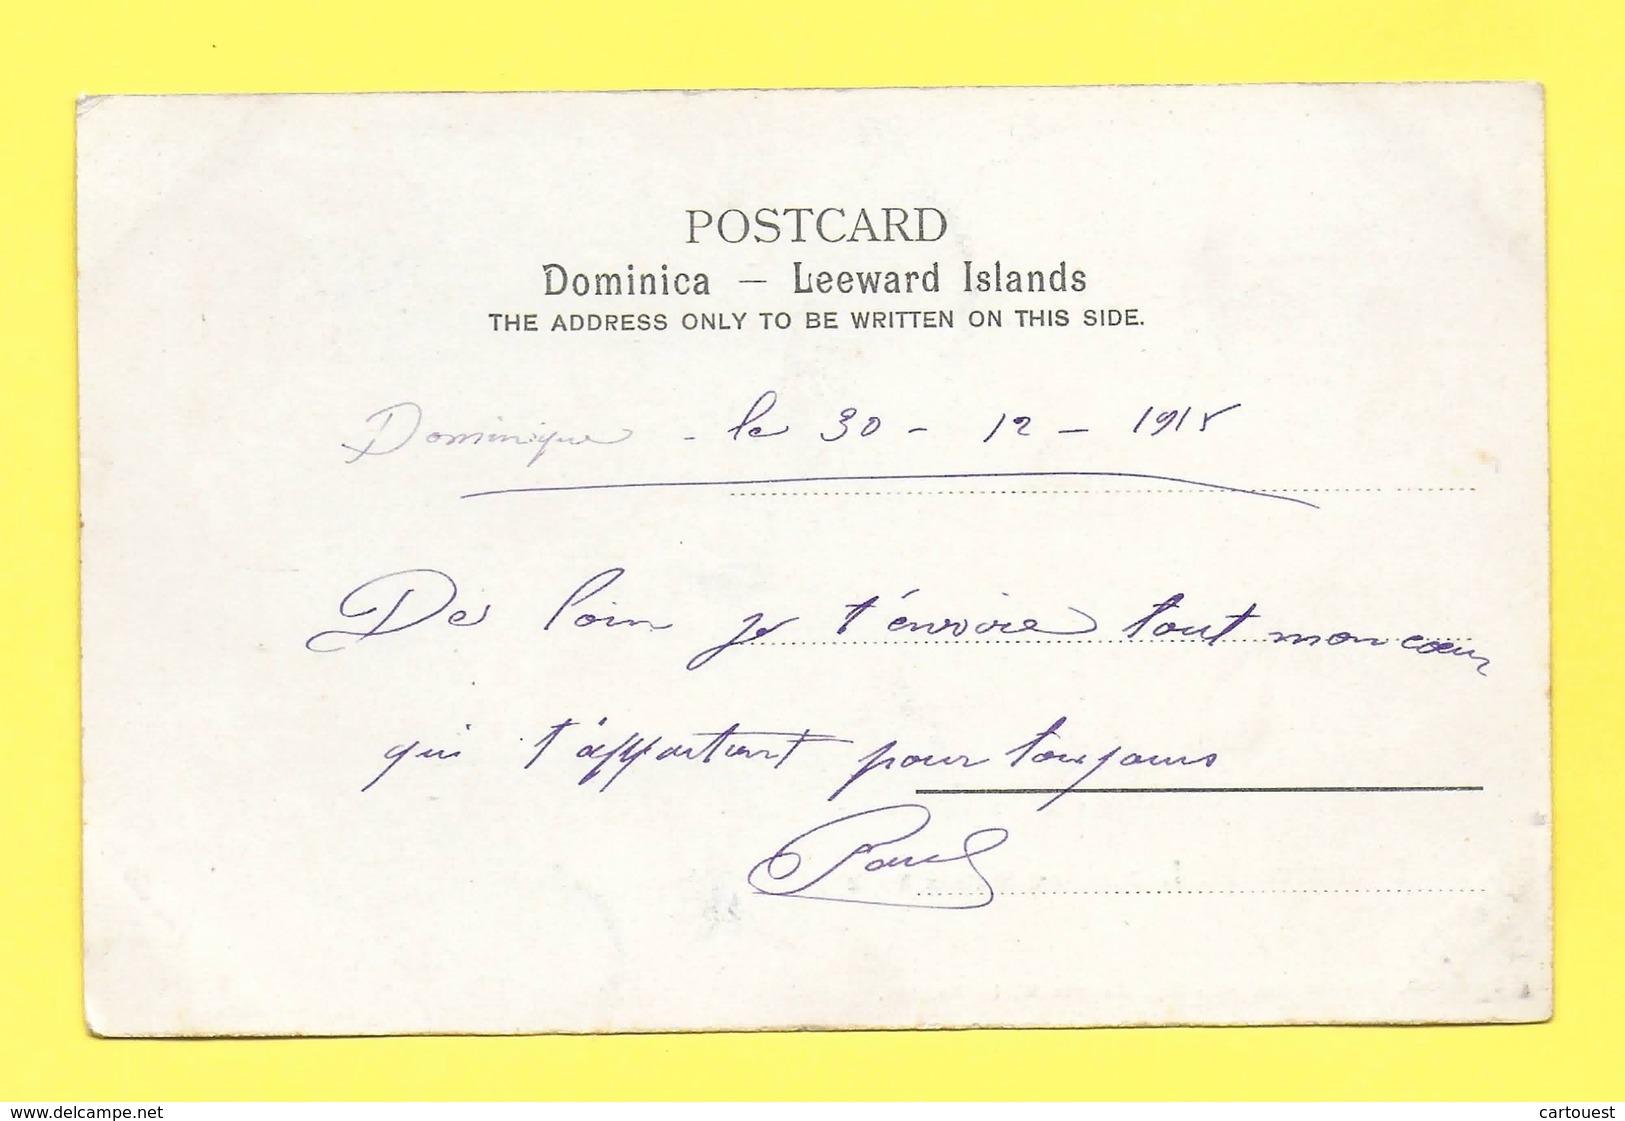 DOMINICA - BOTANICAL STATION 1915 (DOMINIQUE) - Botanical Gardens - Dominique